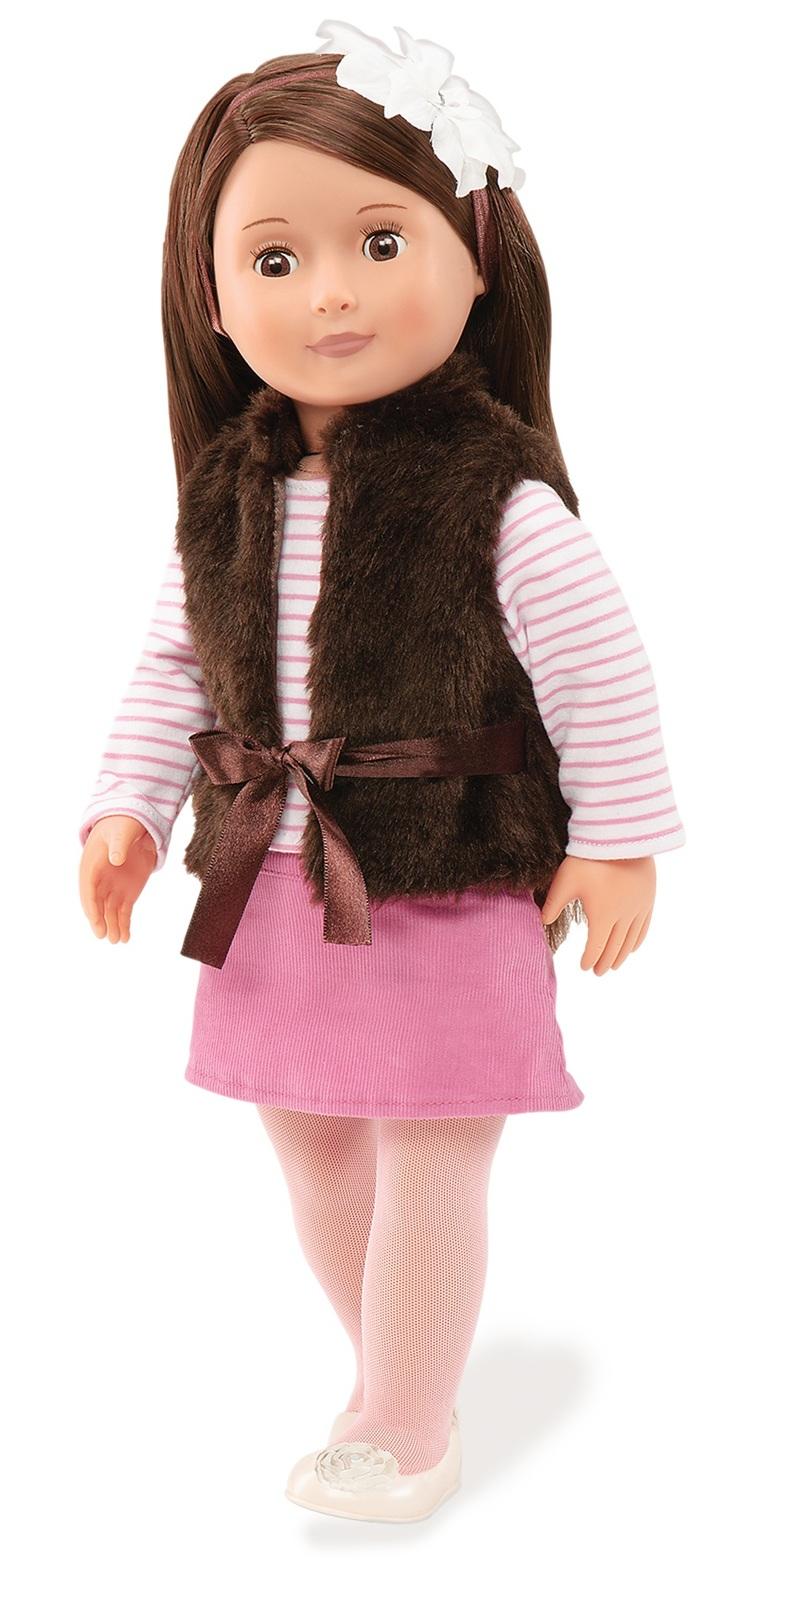 "Sienna - 18"" Regular Doll | Toy | at Mighty Ape Australia"